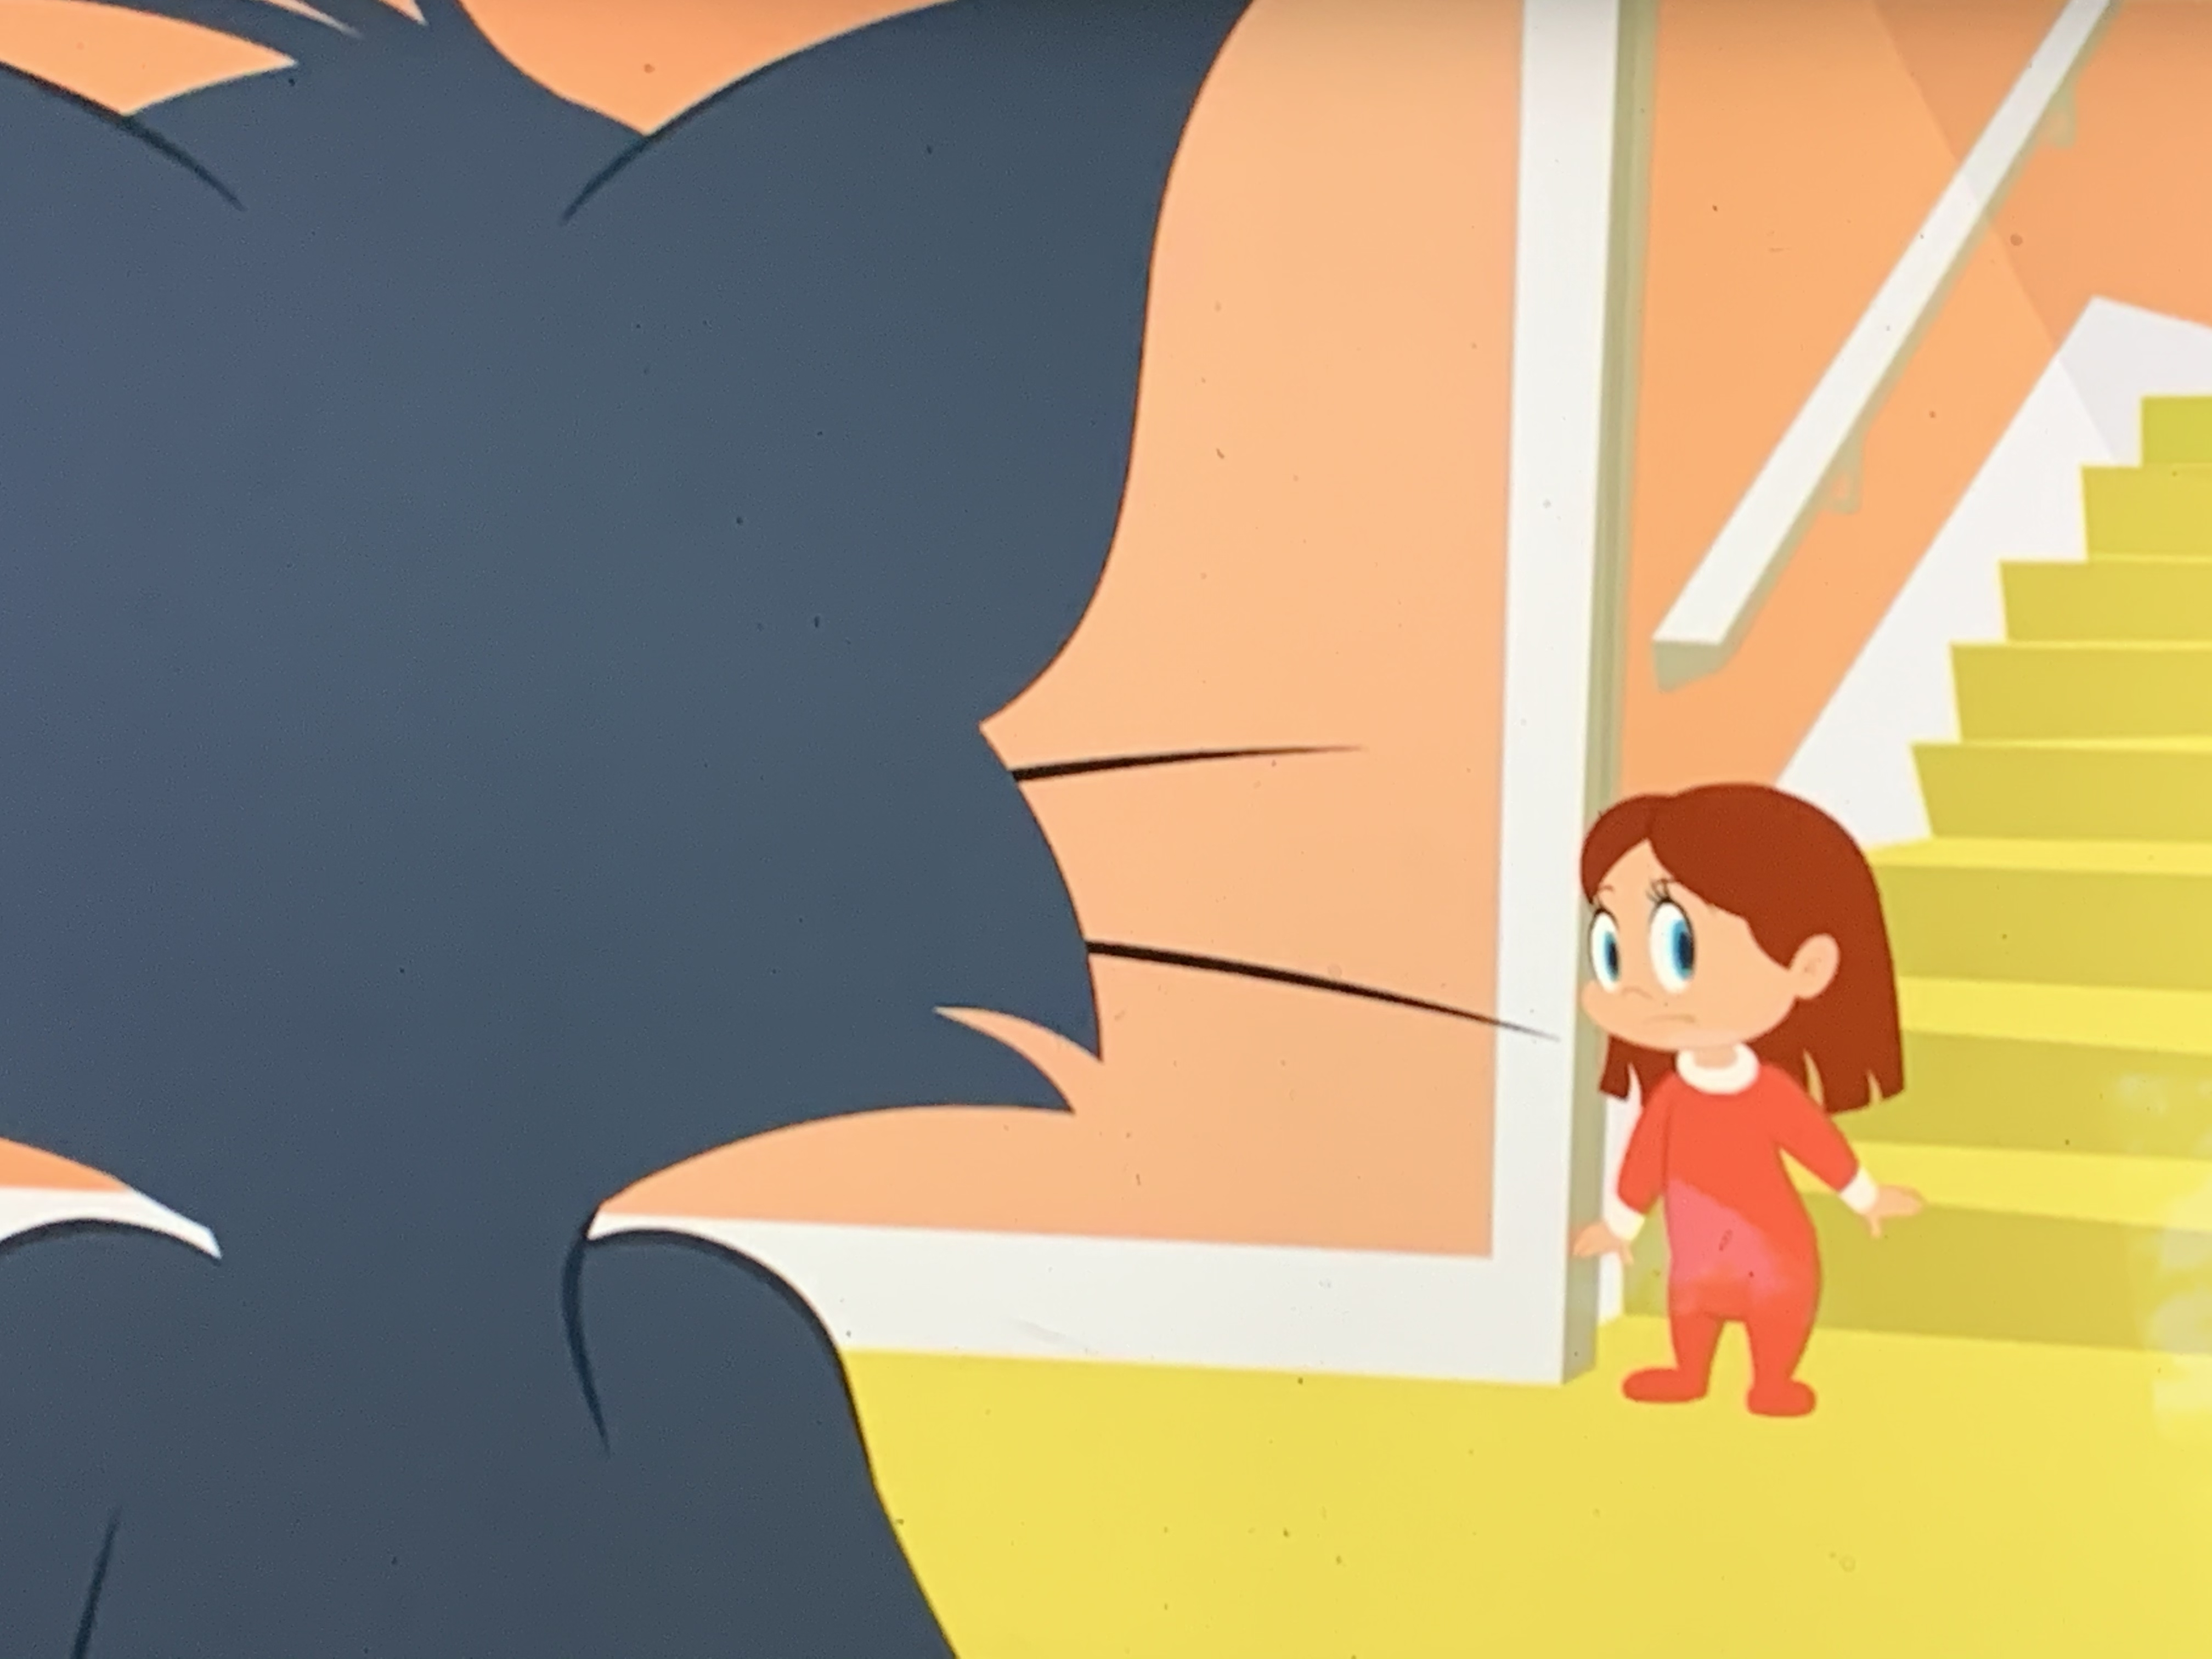 Cindy in Tom & Jerry - Santa's Little Helpers